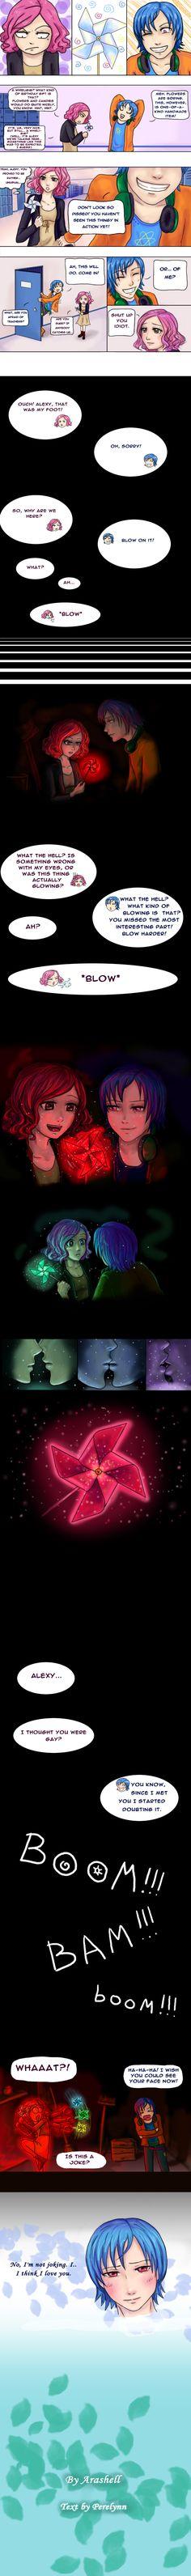 Magic wand (2) by Arashell on DeviantArt